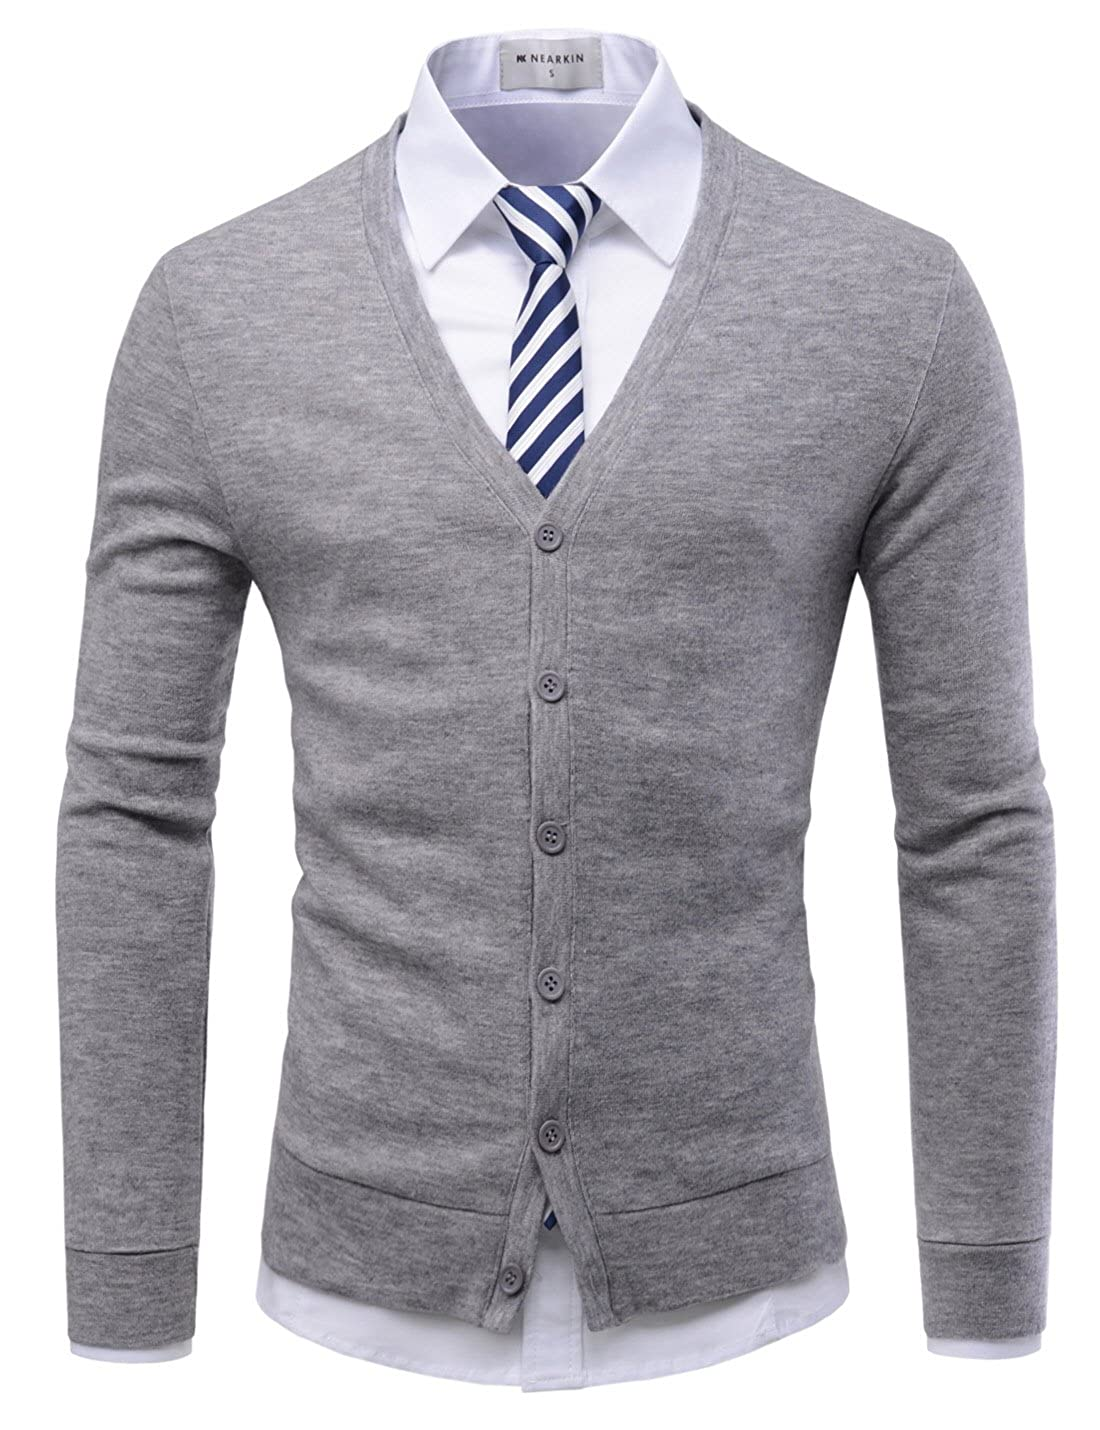 86918578 NEARKIN Mens Casual Shawl Collar Long Sleeve Slim fit Knit Cardigan Sweaters